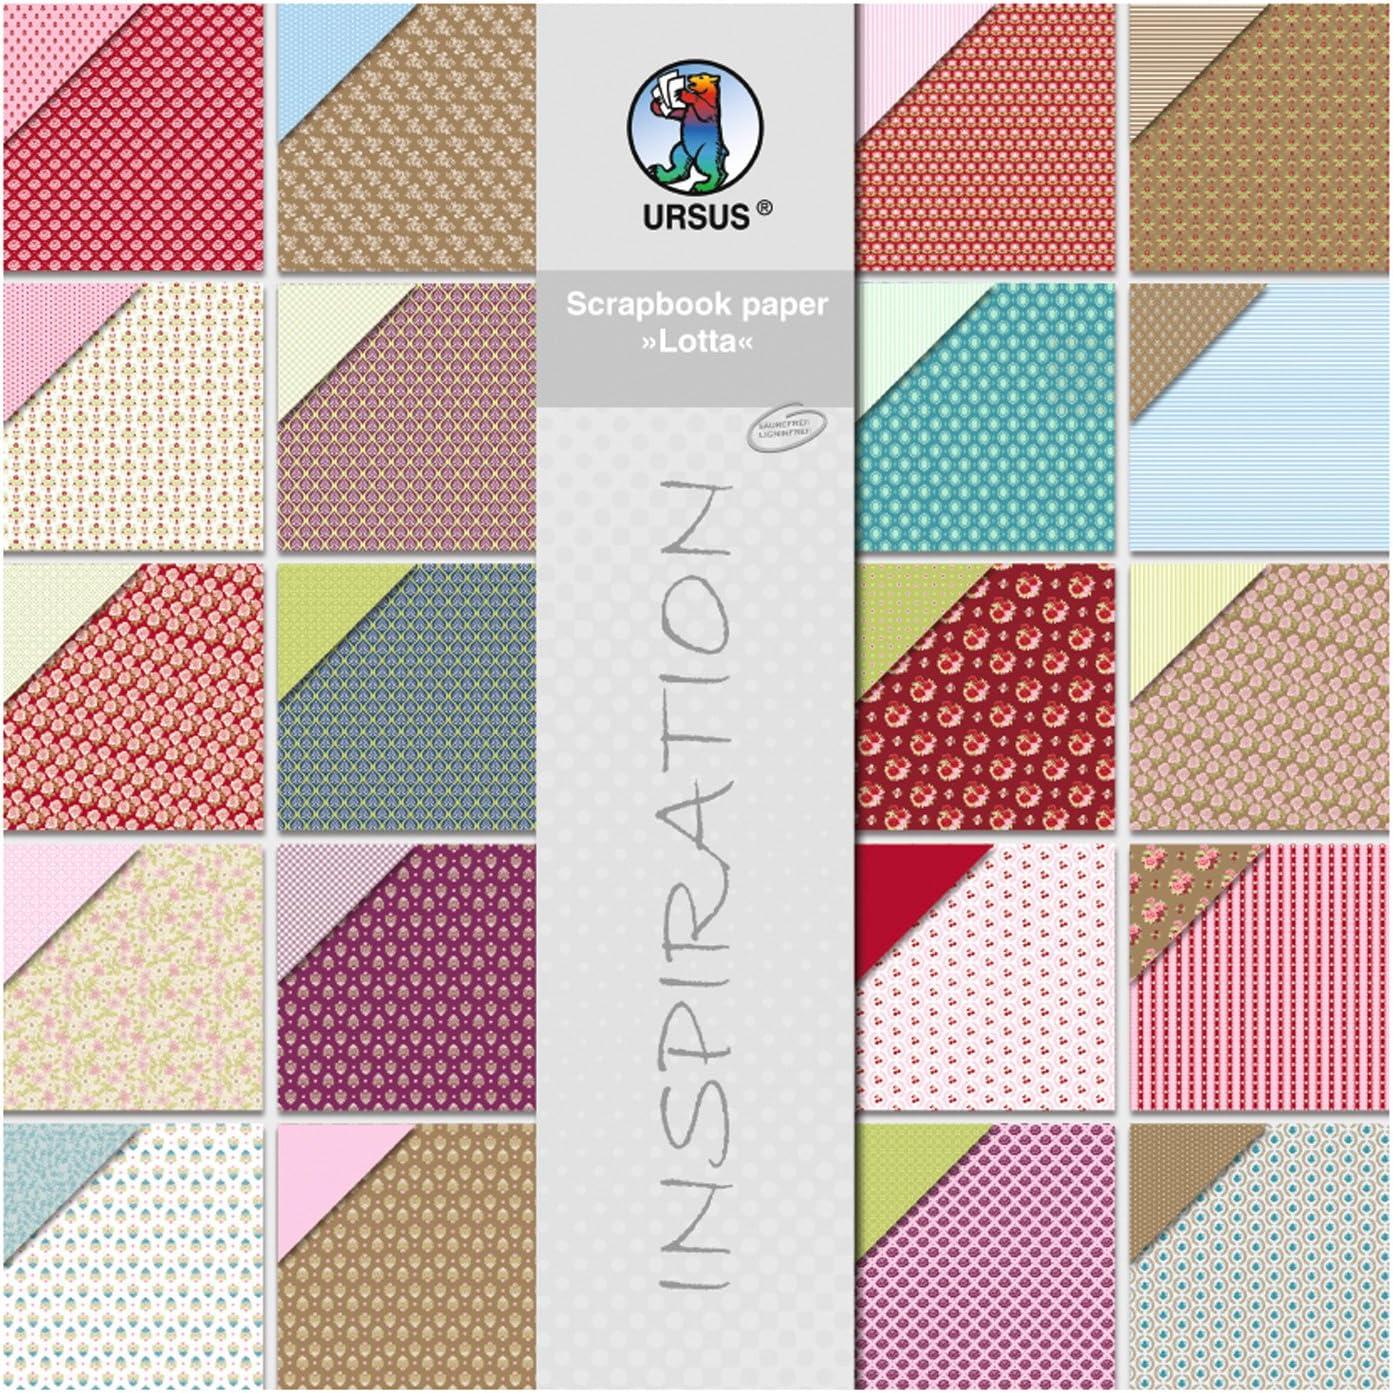 URSUS de Scrapbook Paper bloque Struktura color//modelo surtido